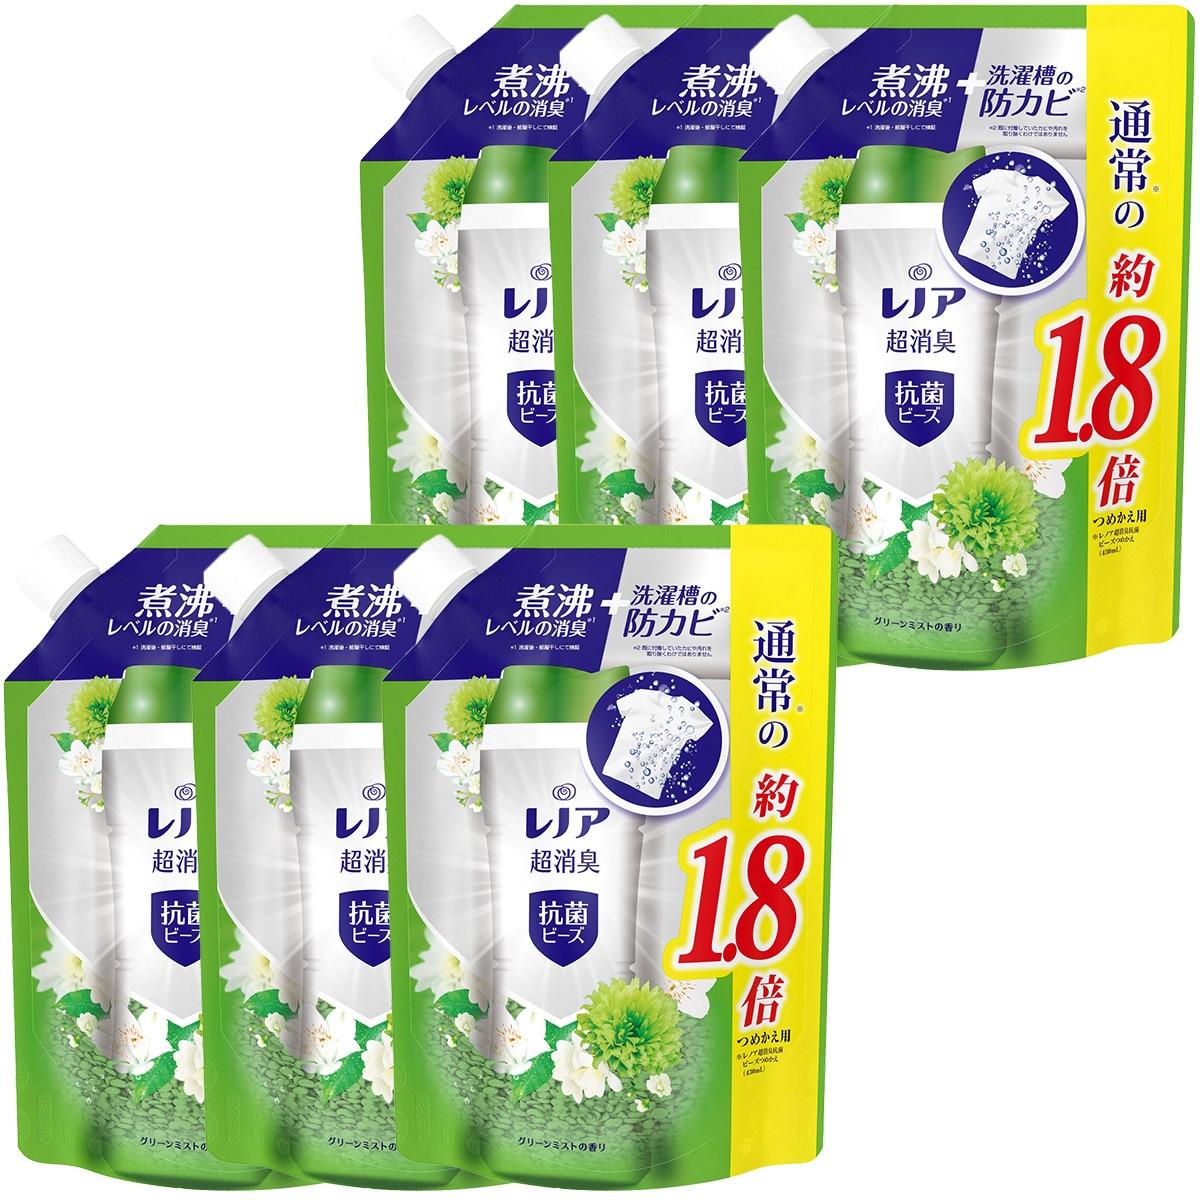 P&G レノア 超消臭+ 抗菌ビーズ グリーンミスト 詰め替え 約1.8倍(760mL/482g)×6袋